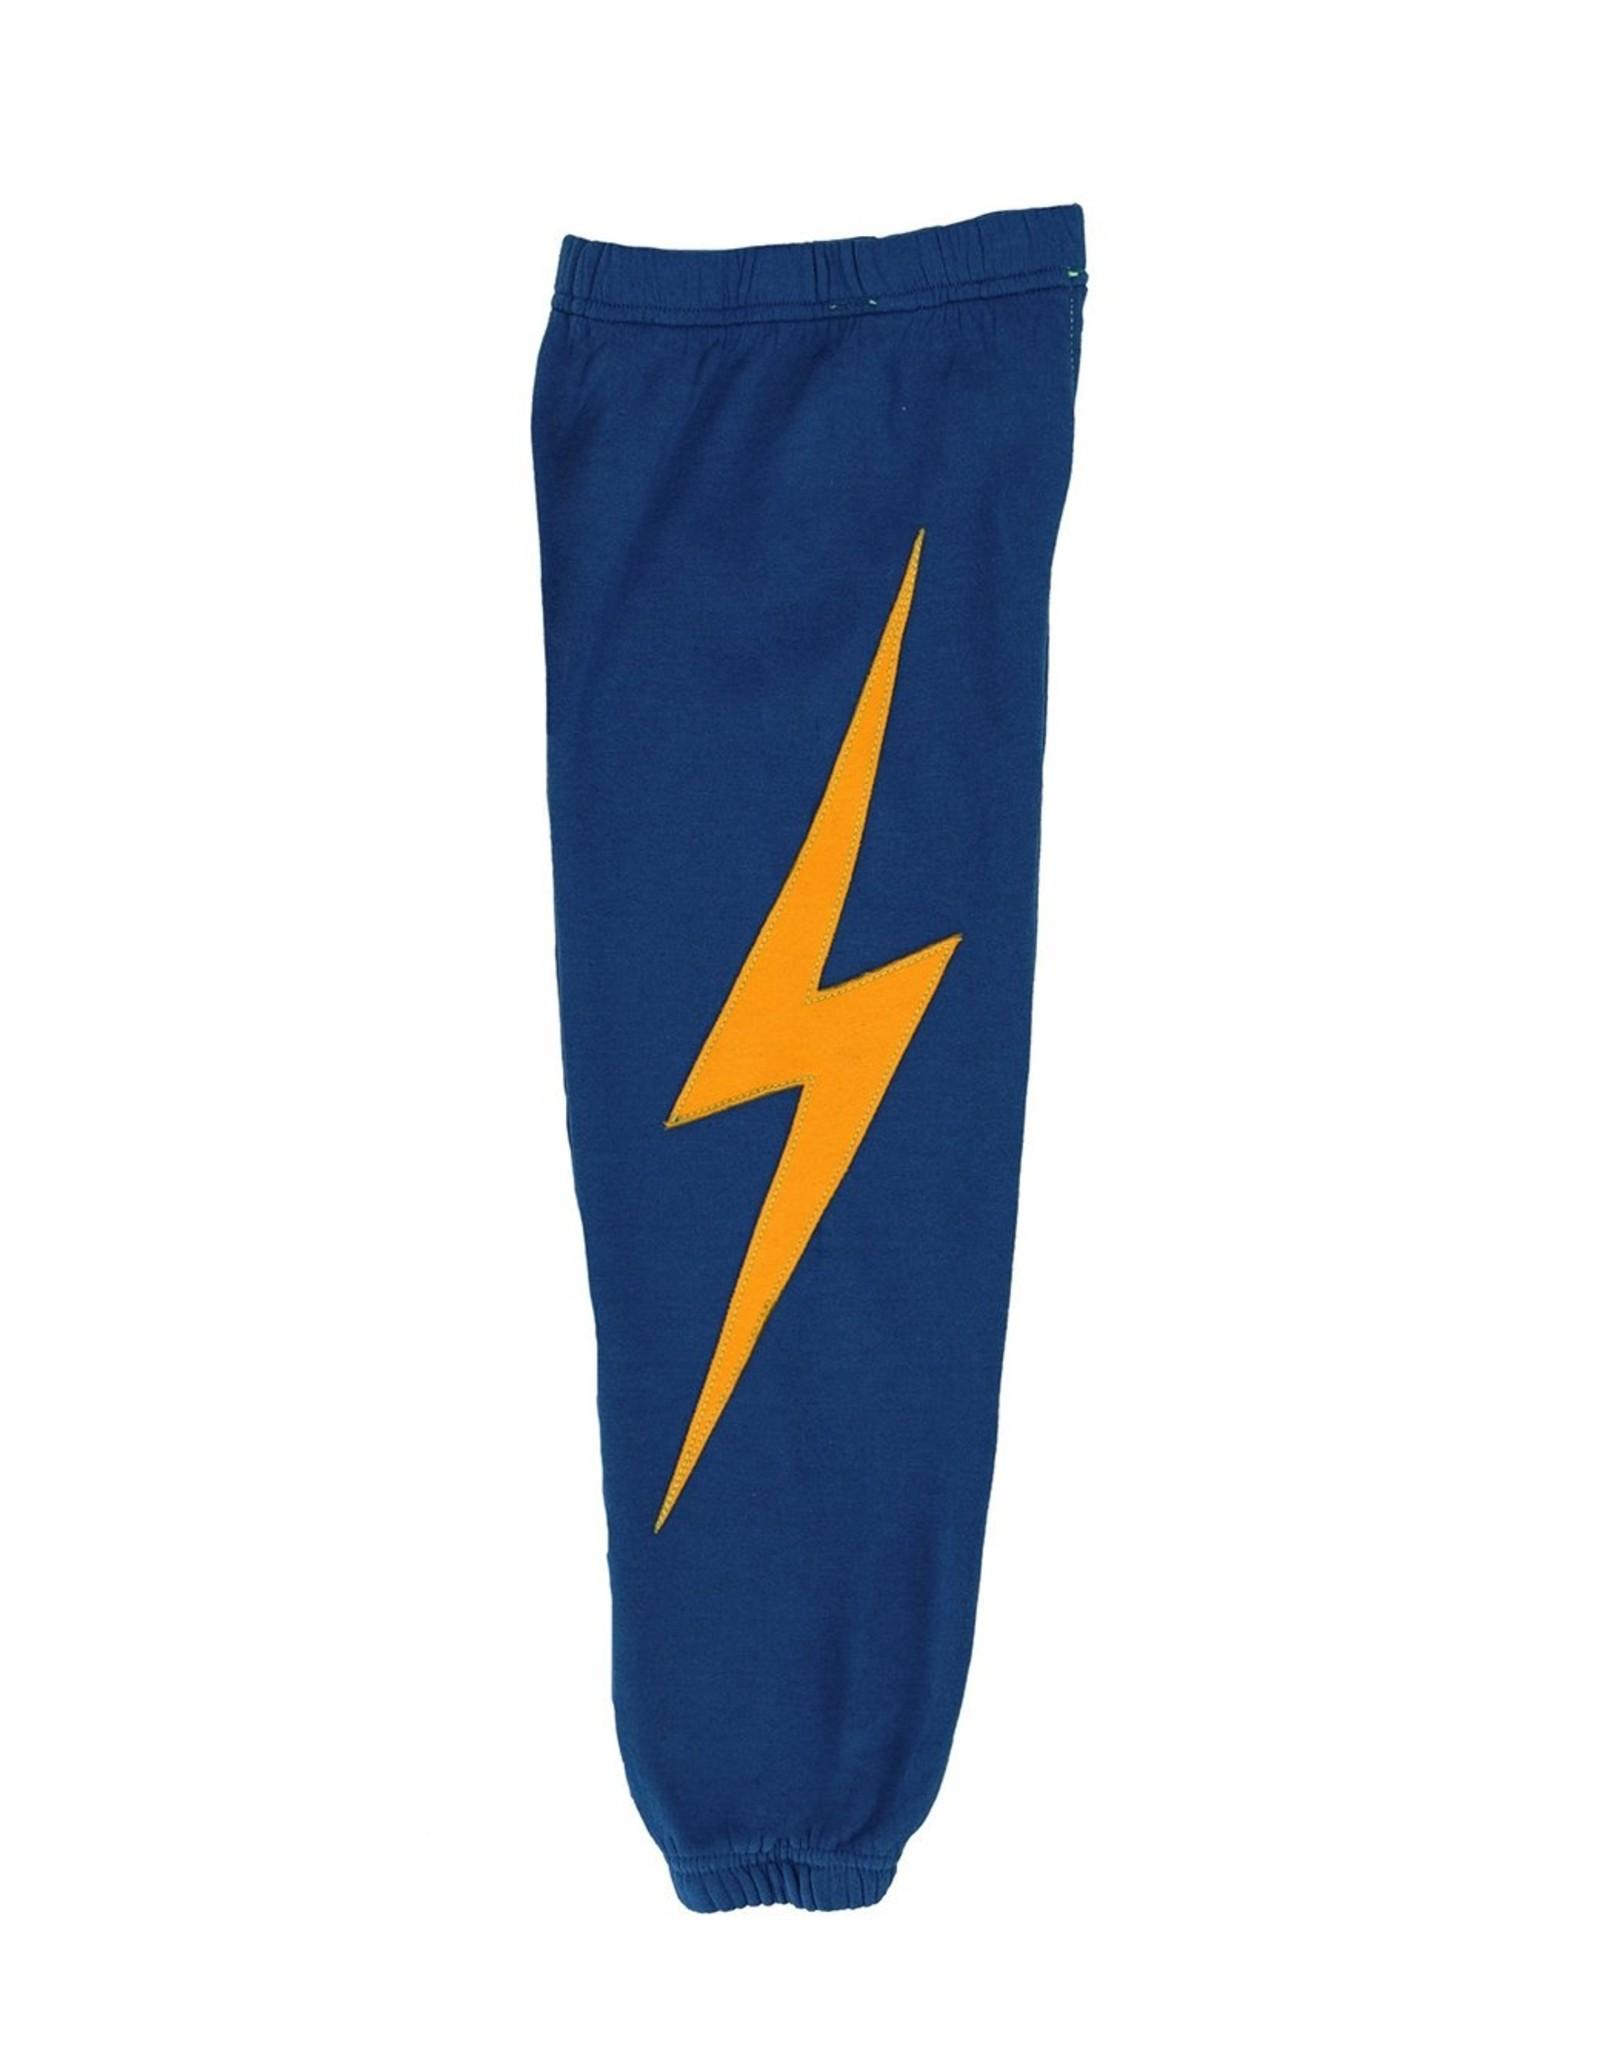 Aviator nation Kid's Bolt Sweatpants